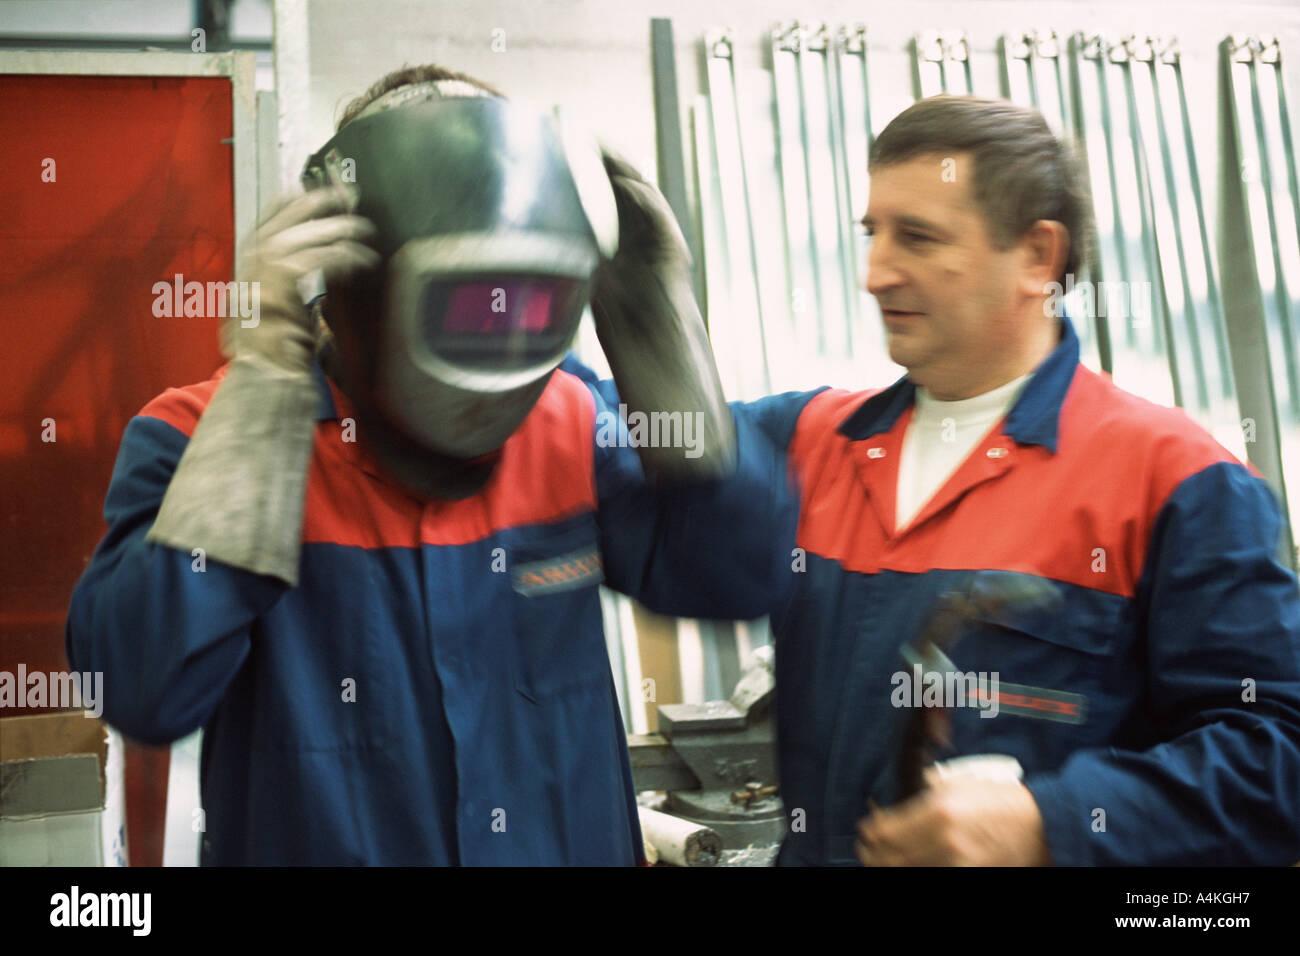 Welder and apprentice - Stock Image